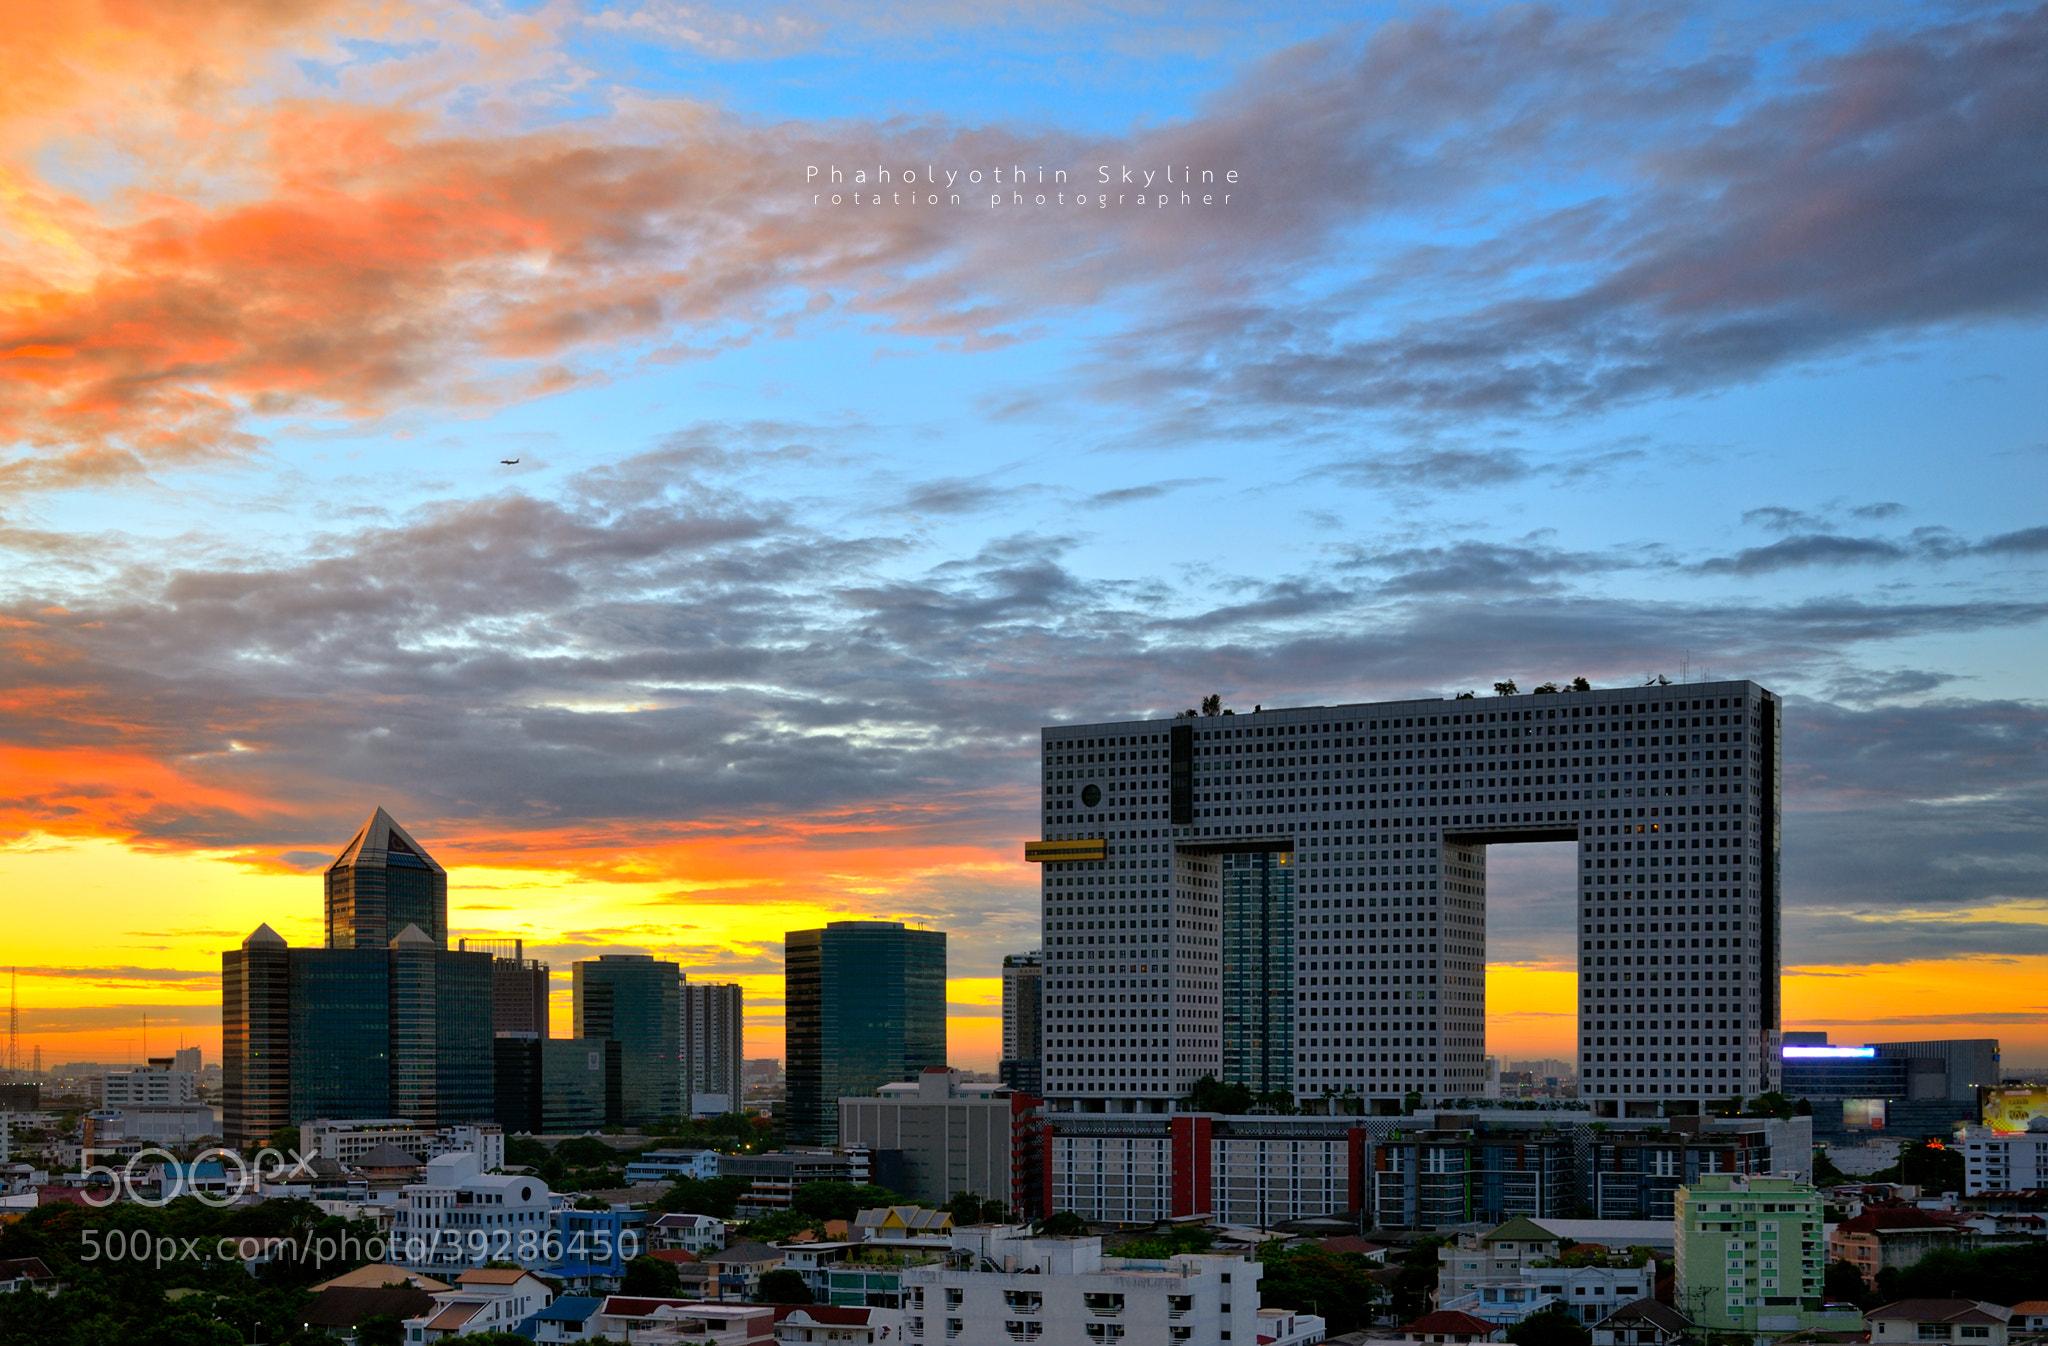 Photograph Phaholyothin Skyline by Jirawas Teekayu on 500px